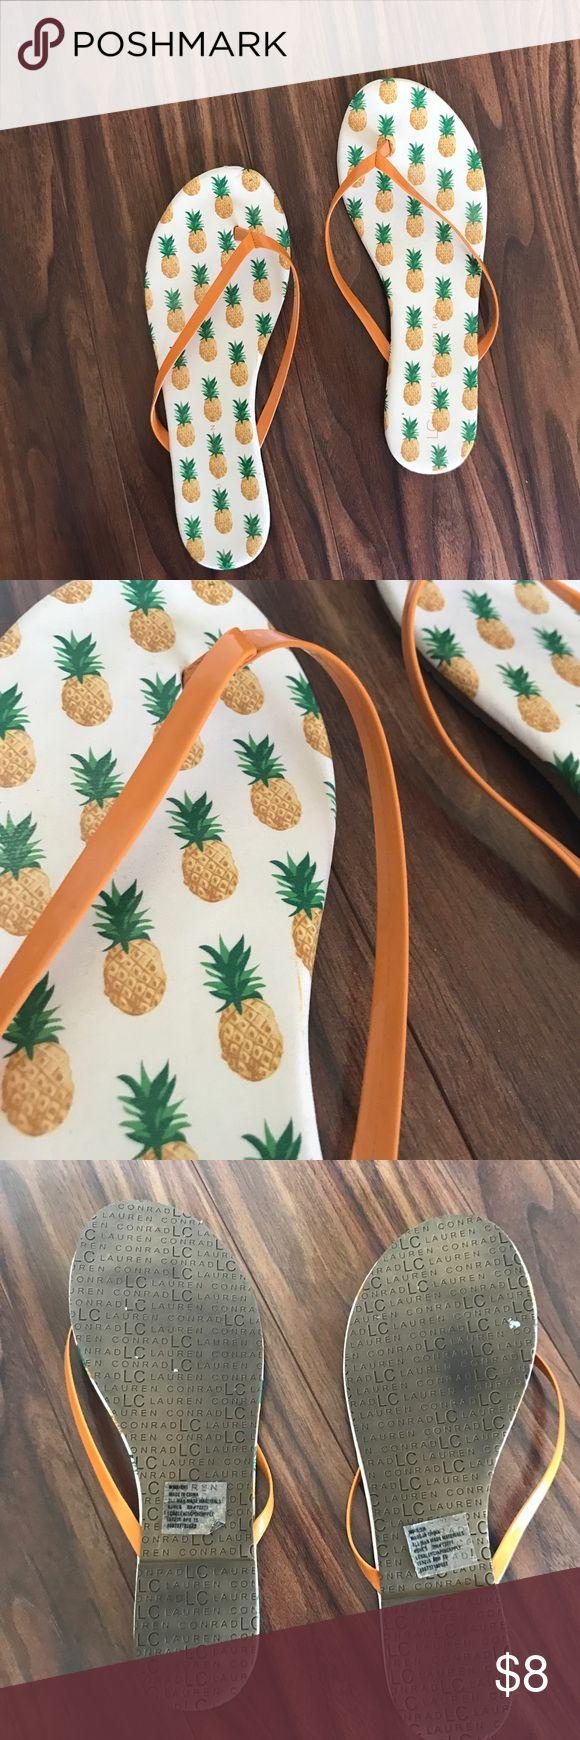 ⚡️FLASH SALE⚡️ Lauren Conrad pineapple flip flops Worn a handful of times. Cute pineapple flip flops by Lauren Conrads brand LC Lauren Conrad Shoes Sandals